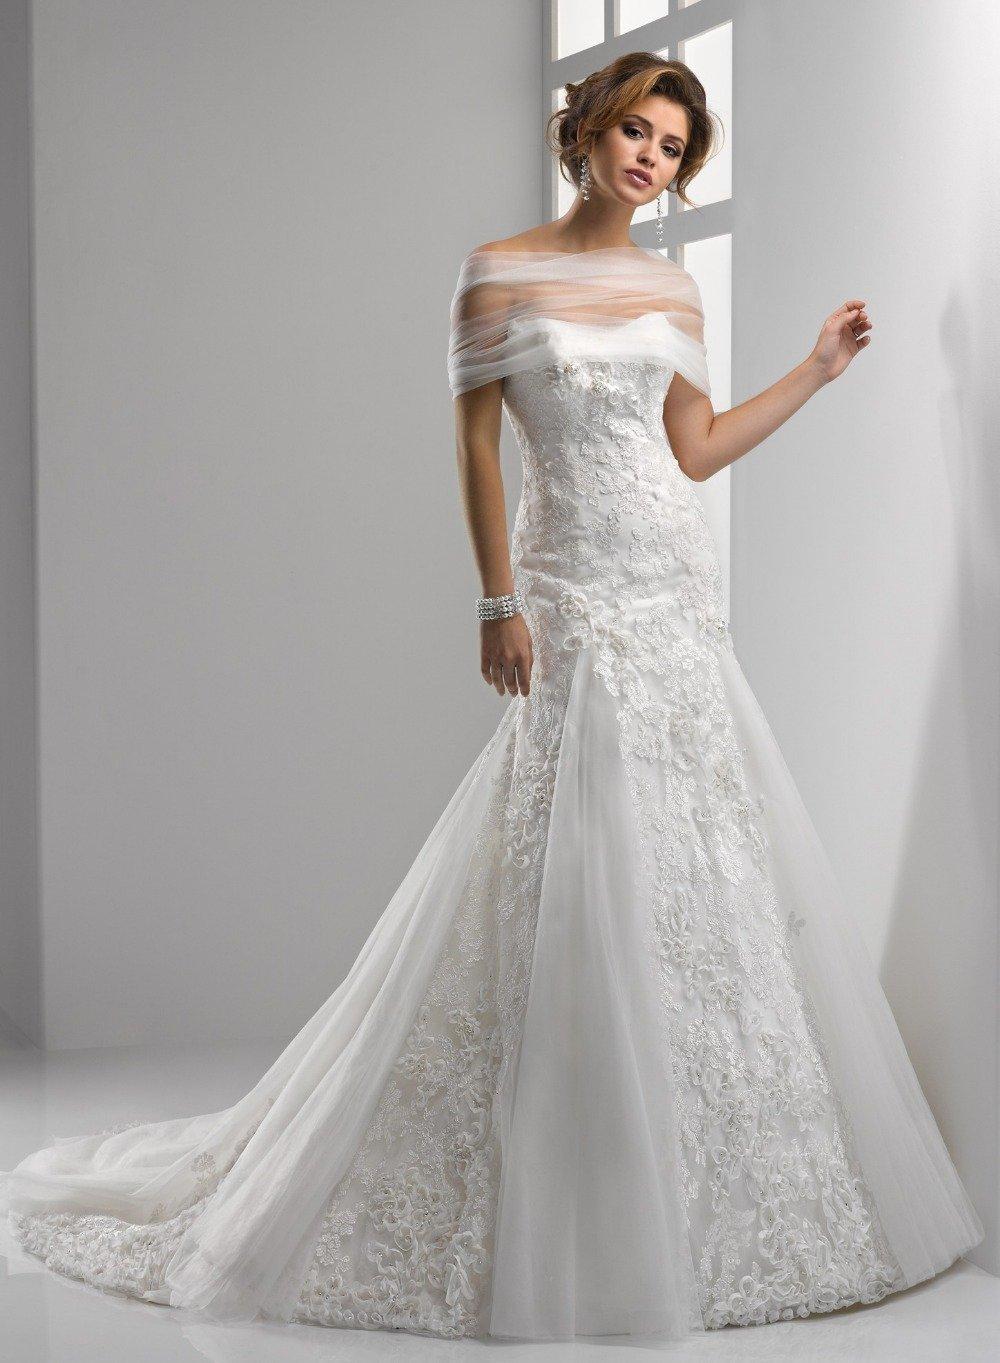 Sexy Wedding Dress A-Line Backless White Sweetheart Plus Size Long Lace Wedding Dress